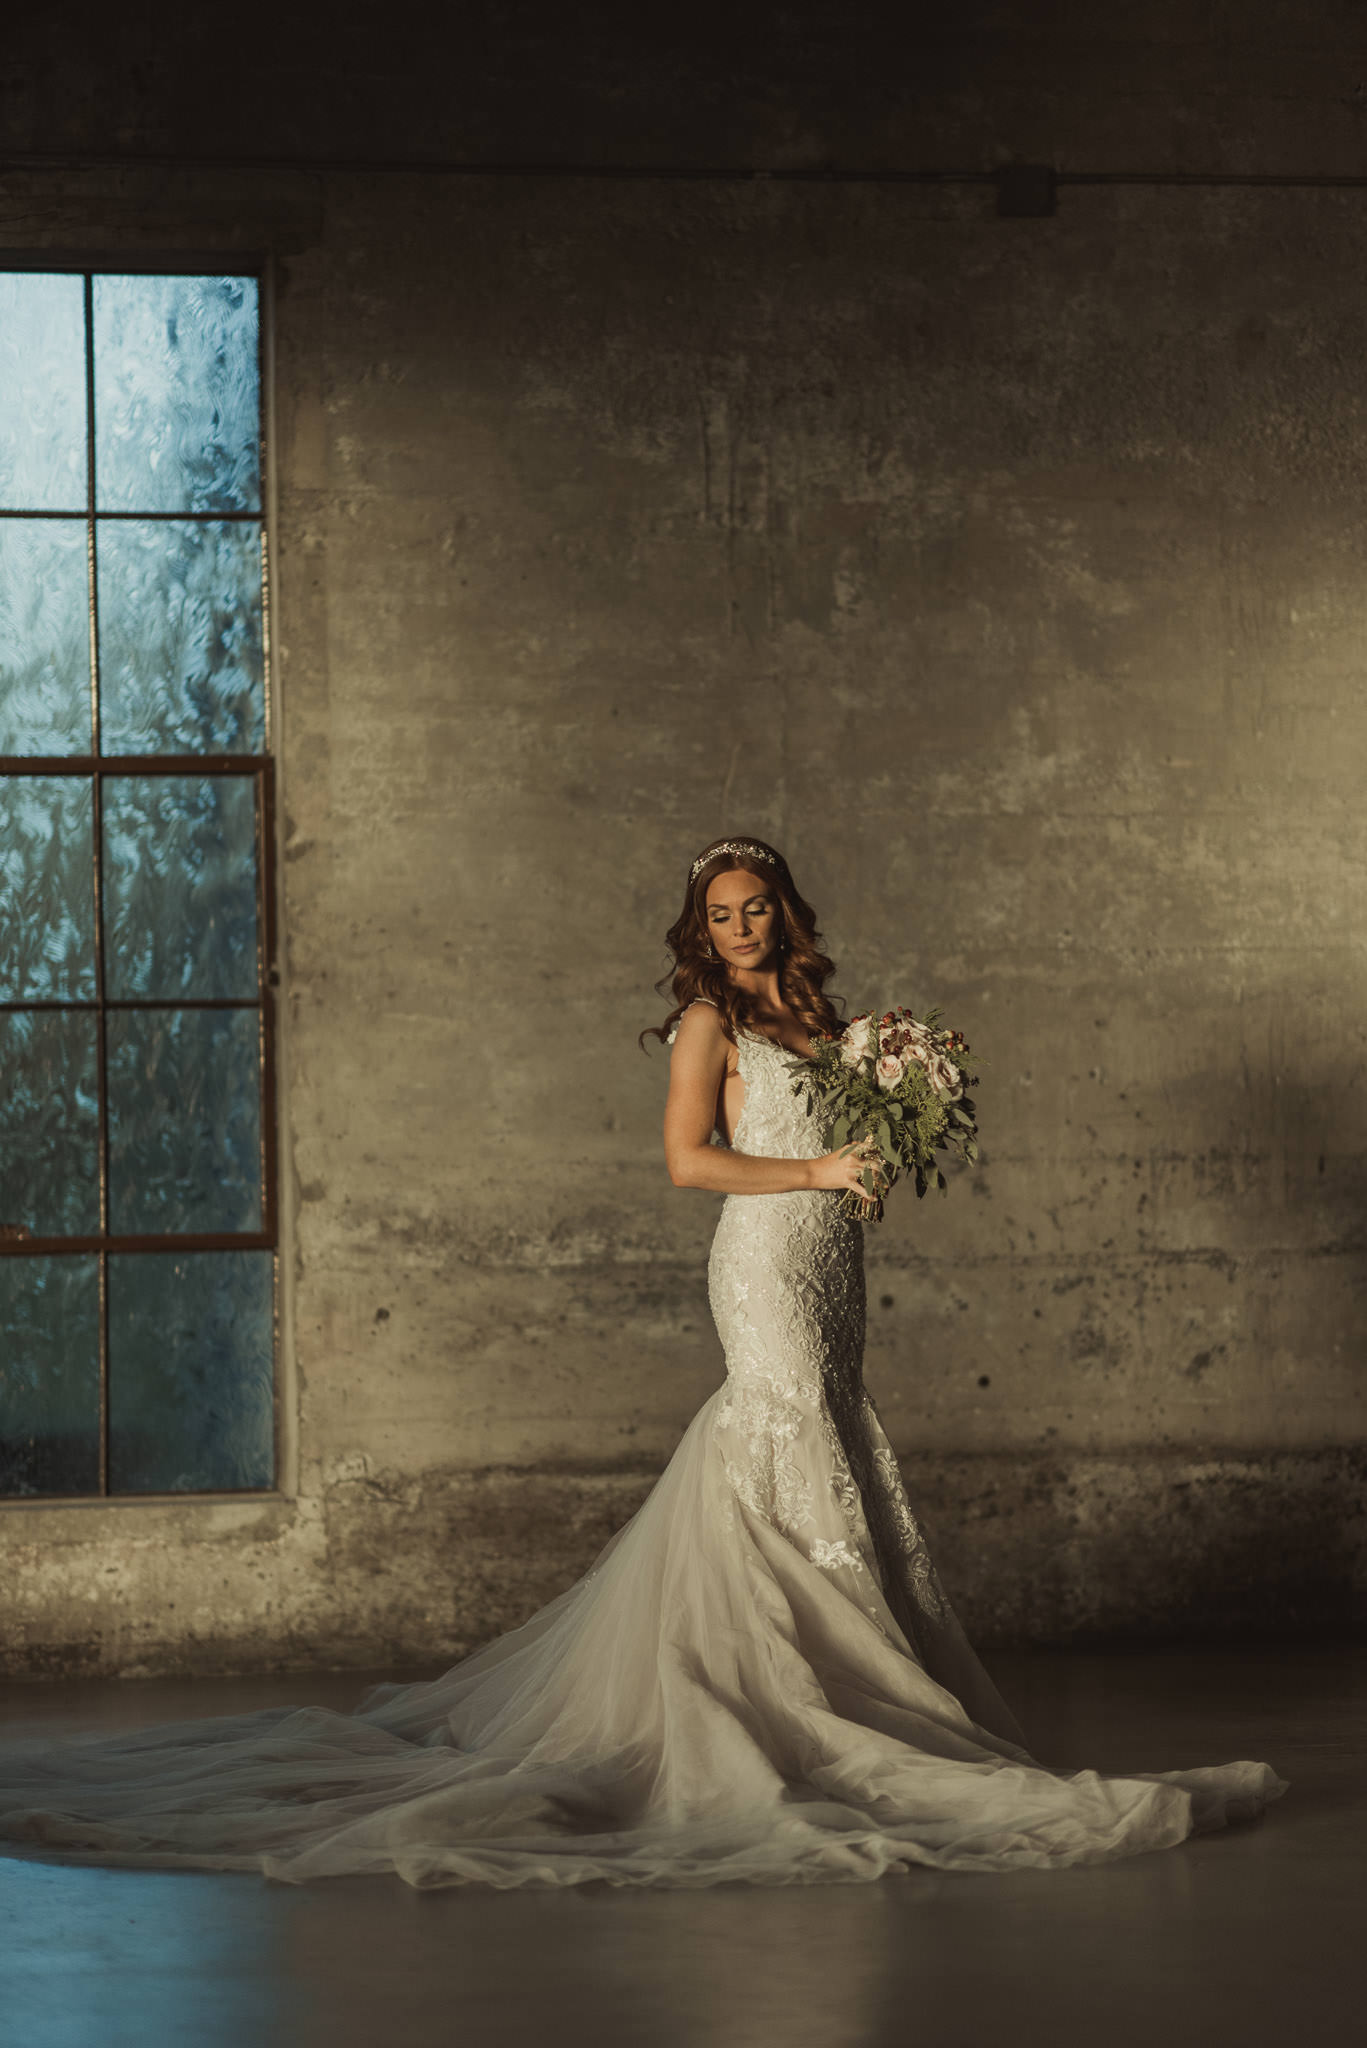 Cynthia-Curtis-Olde-Dobbine-Station-Houston-Wedding-Photographer-sm-61.jpg